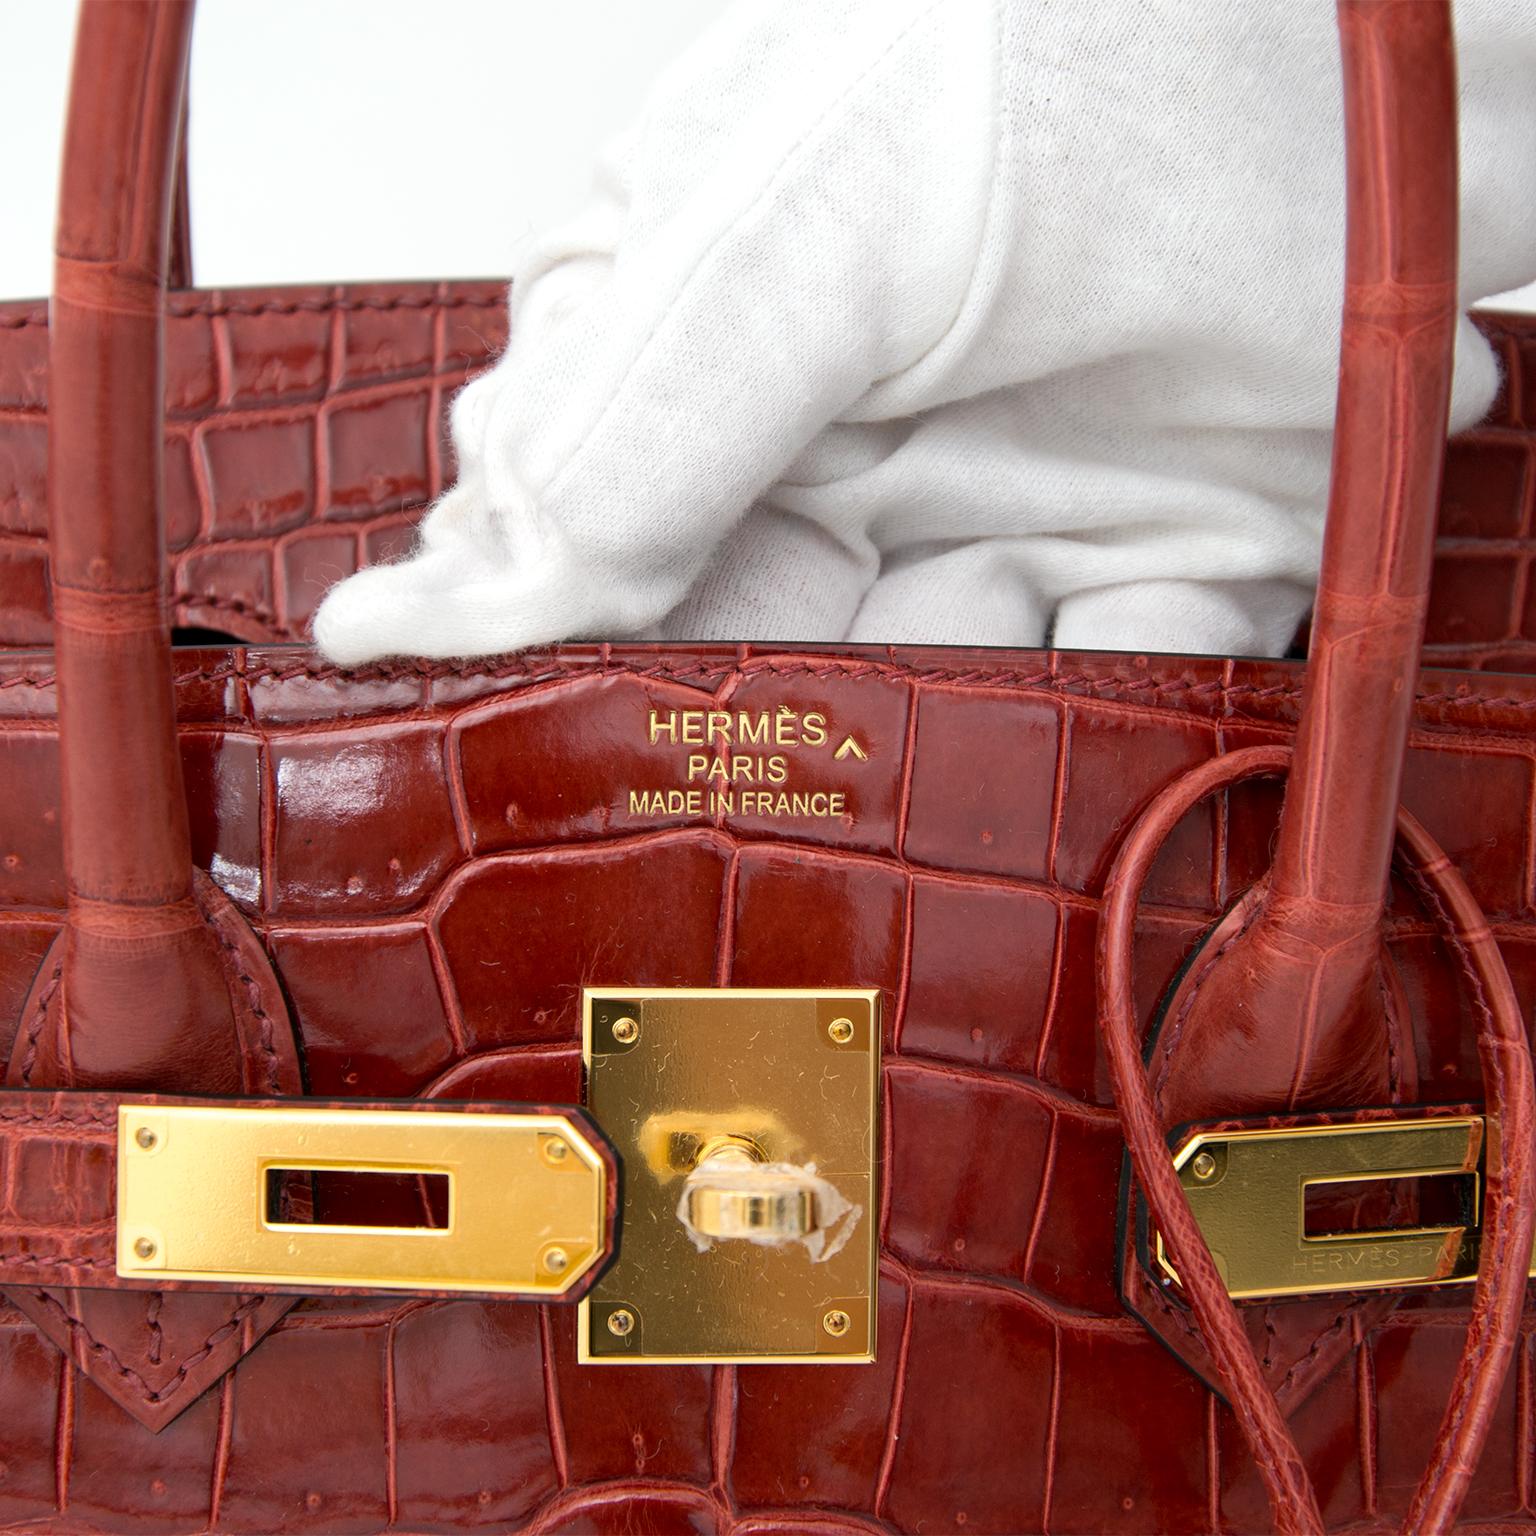 Extremely RARE & NEW Hermès Birkin 35 GHW Crocodile Porosus Lisse Rouge H